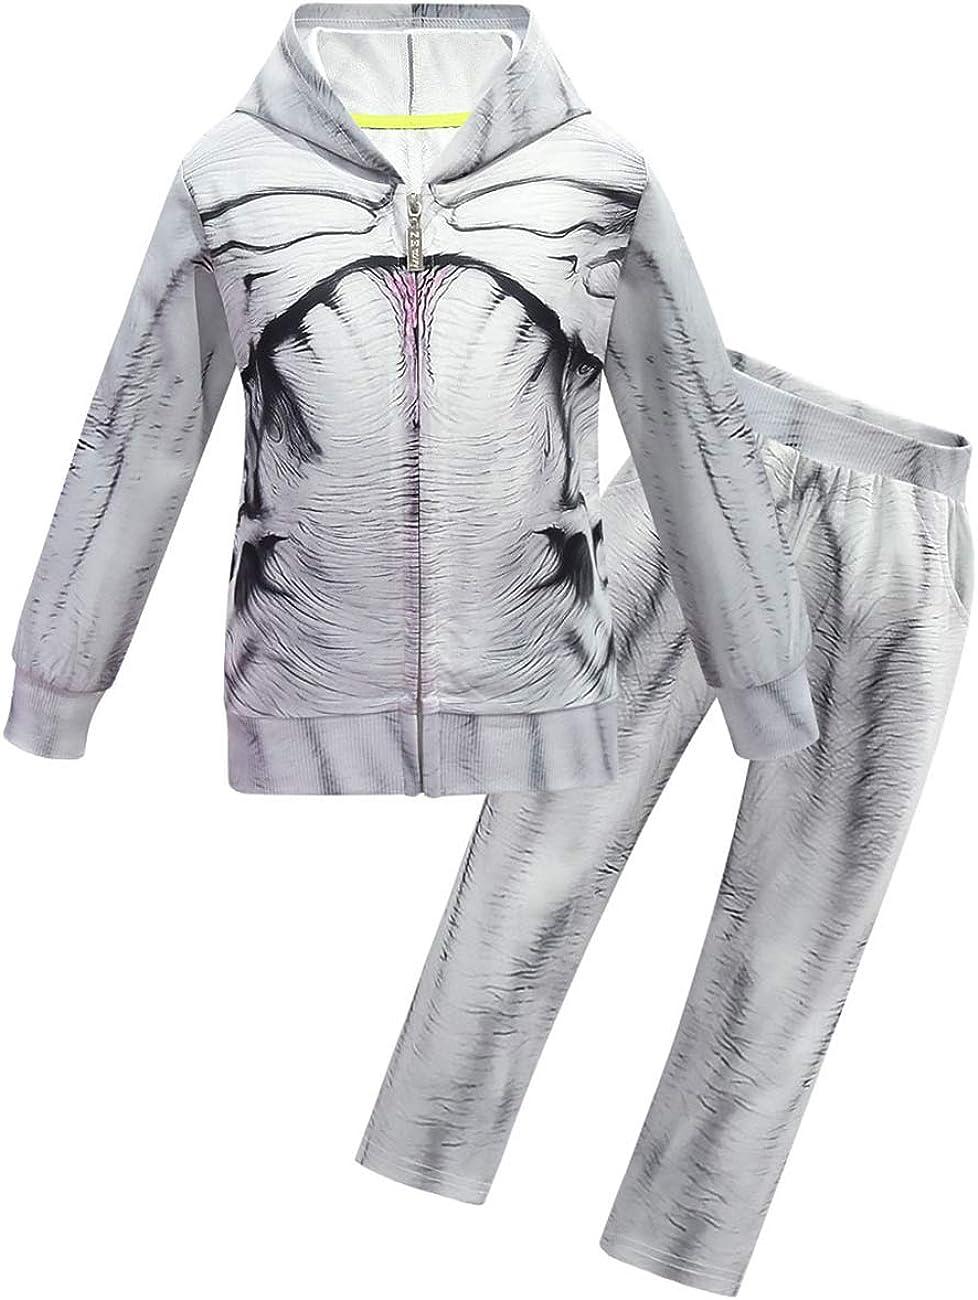 Disfraz Stranger Things Niños, Costume Stranger Things Demogorgon ...